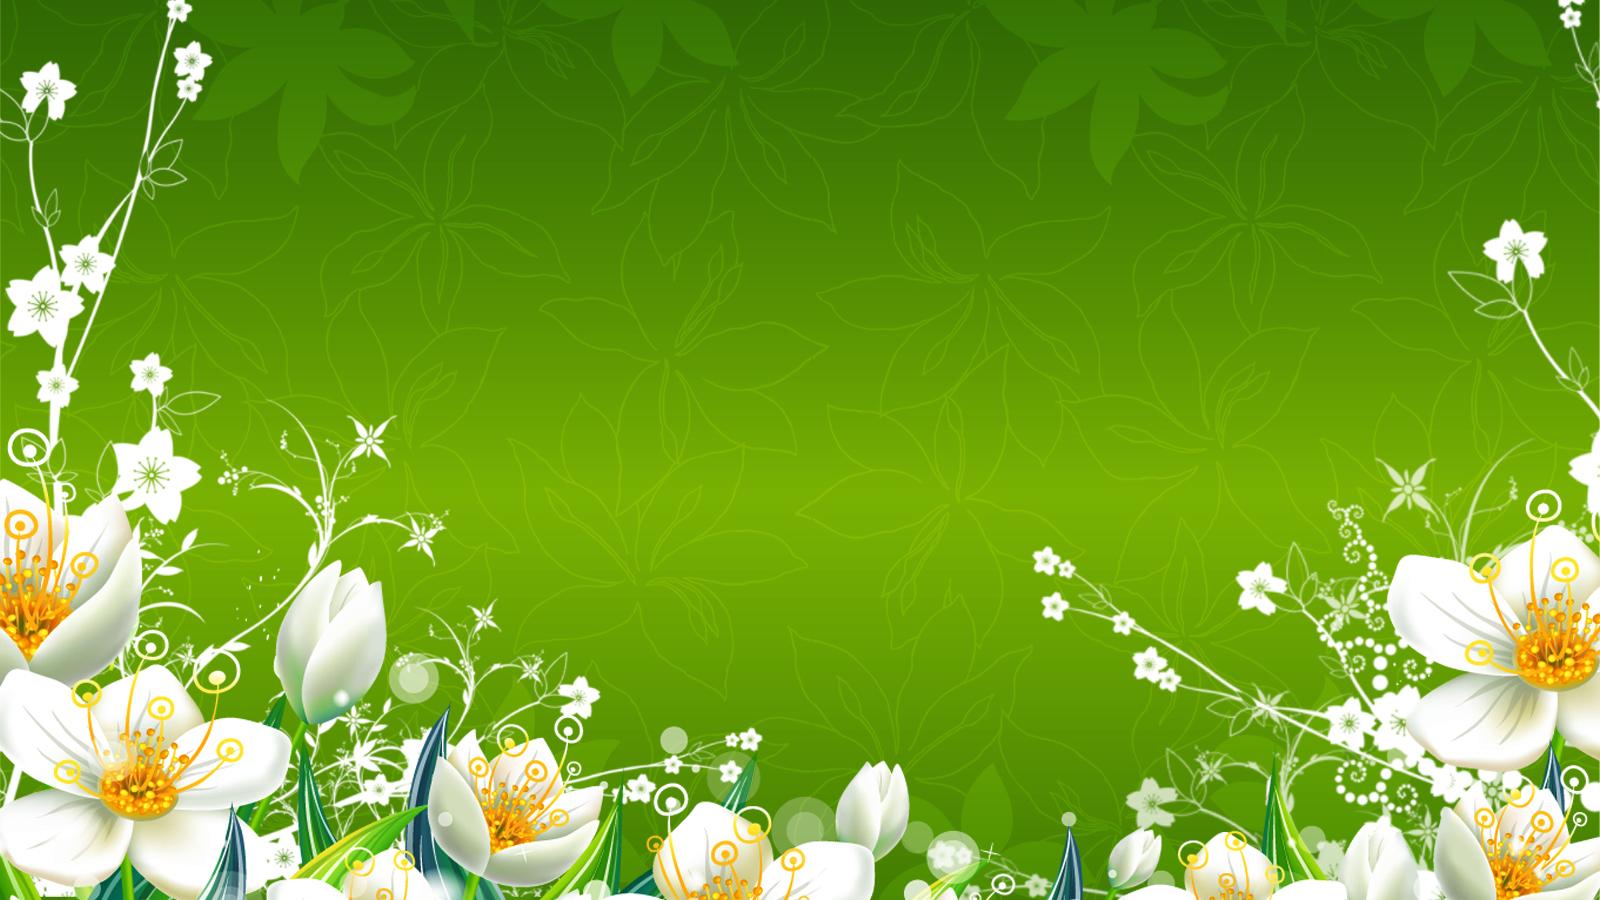 Free Download Green Flowers Wallpaper 1600x1250 Green Flowers